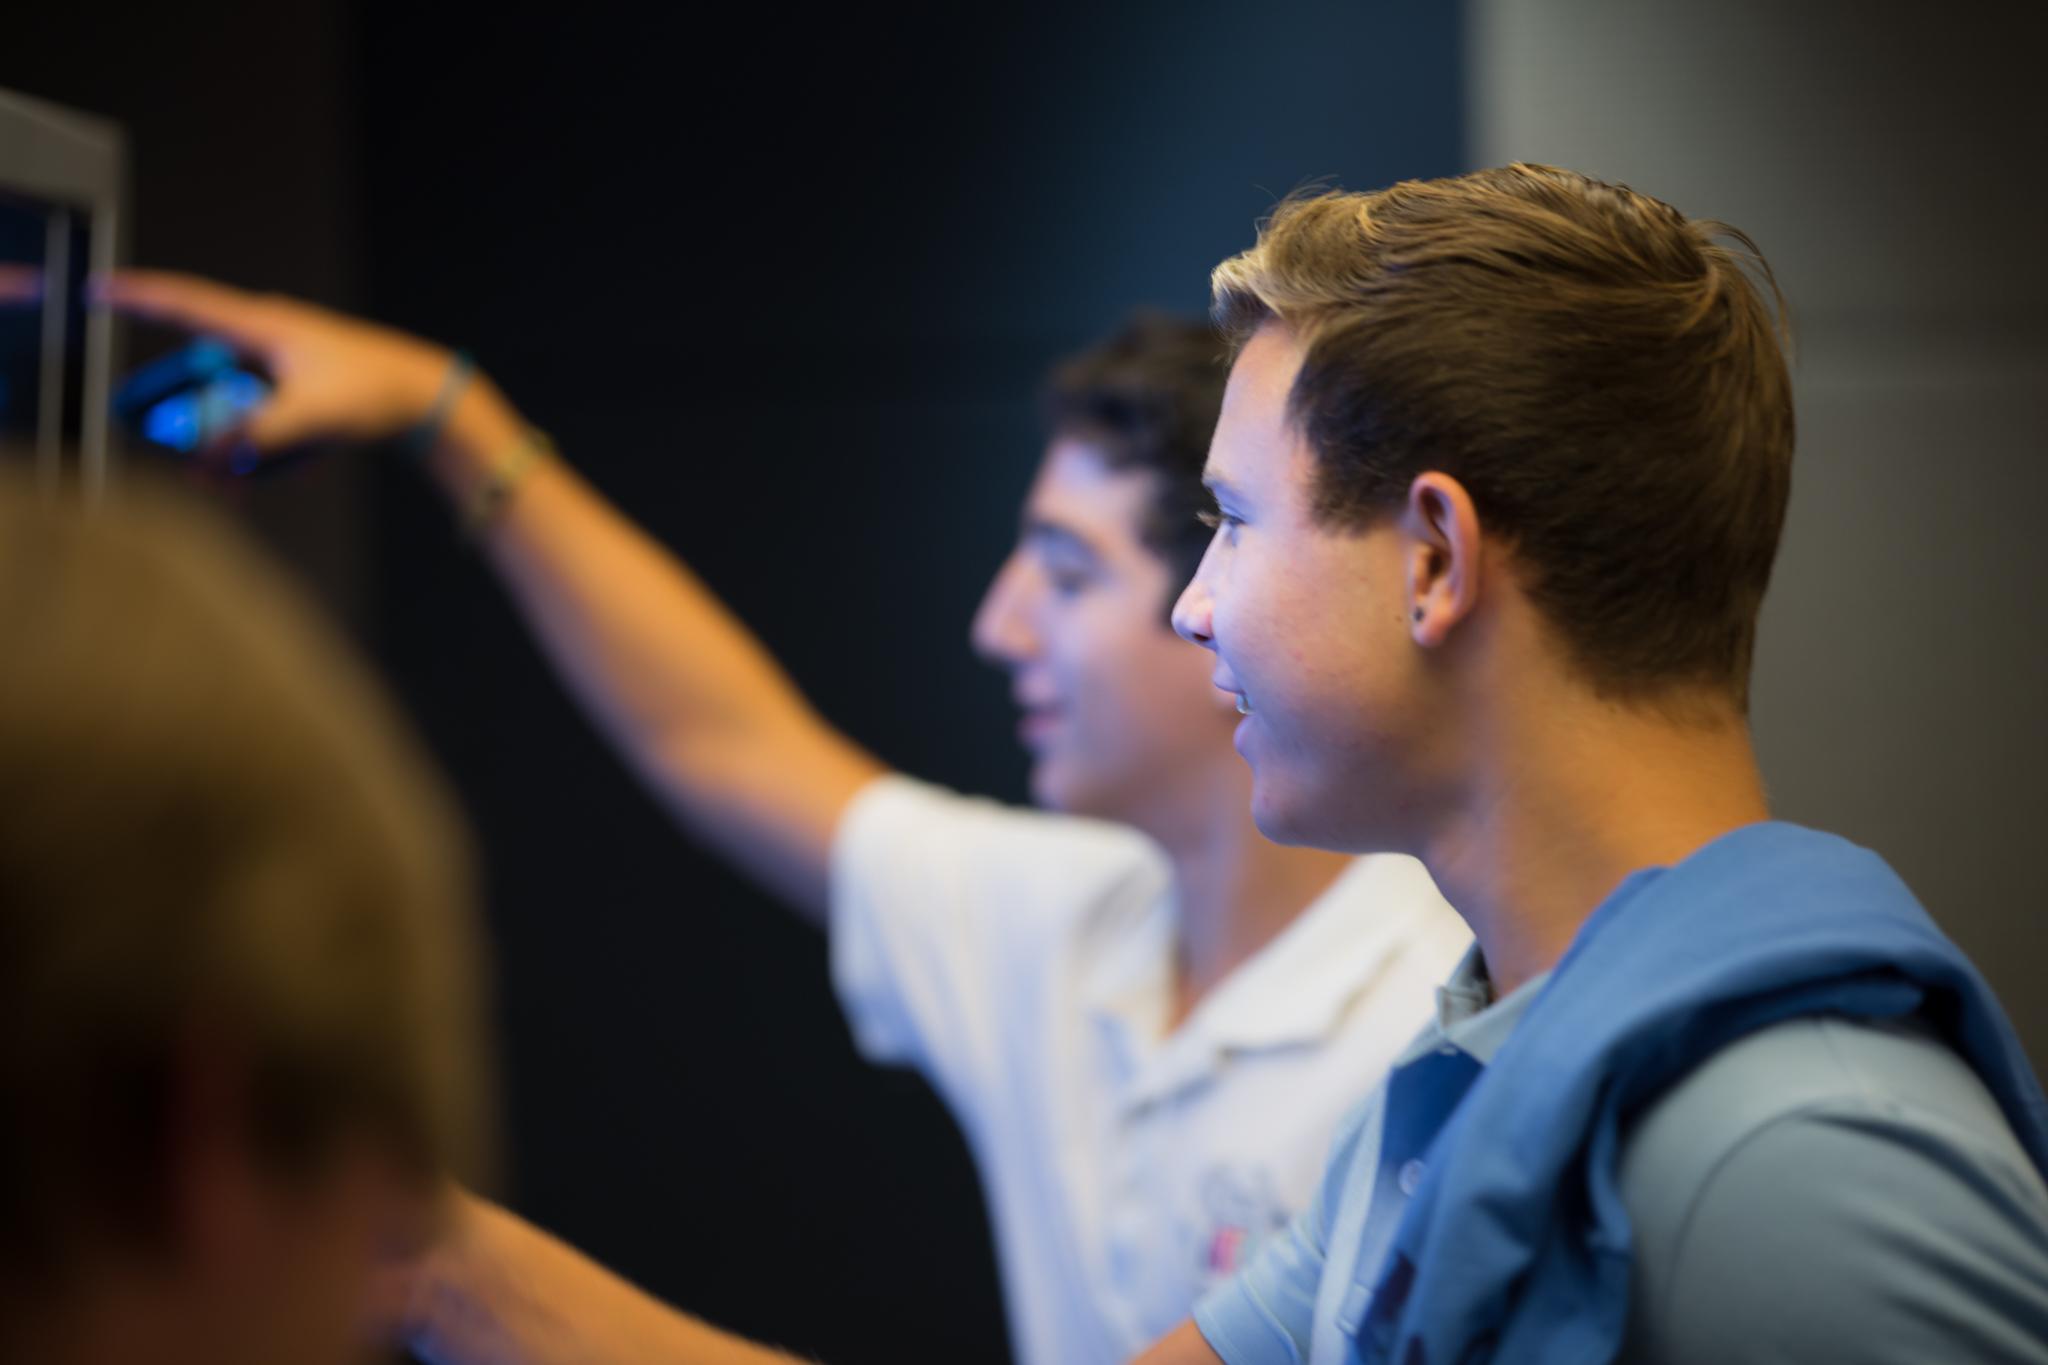 FS_LABS_One_School_of_the_Arts_Aug.24_10.jpg